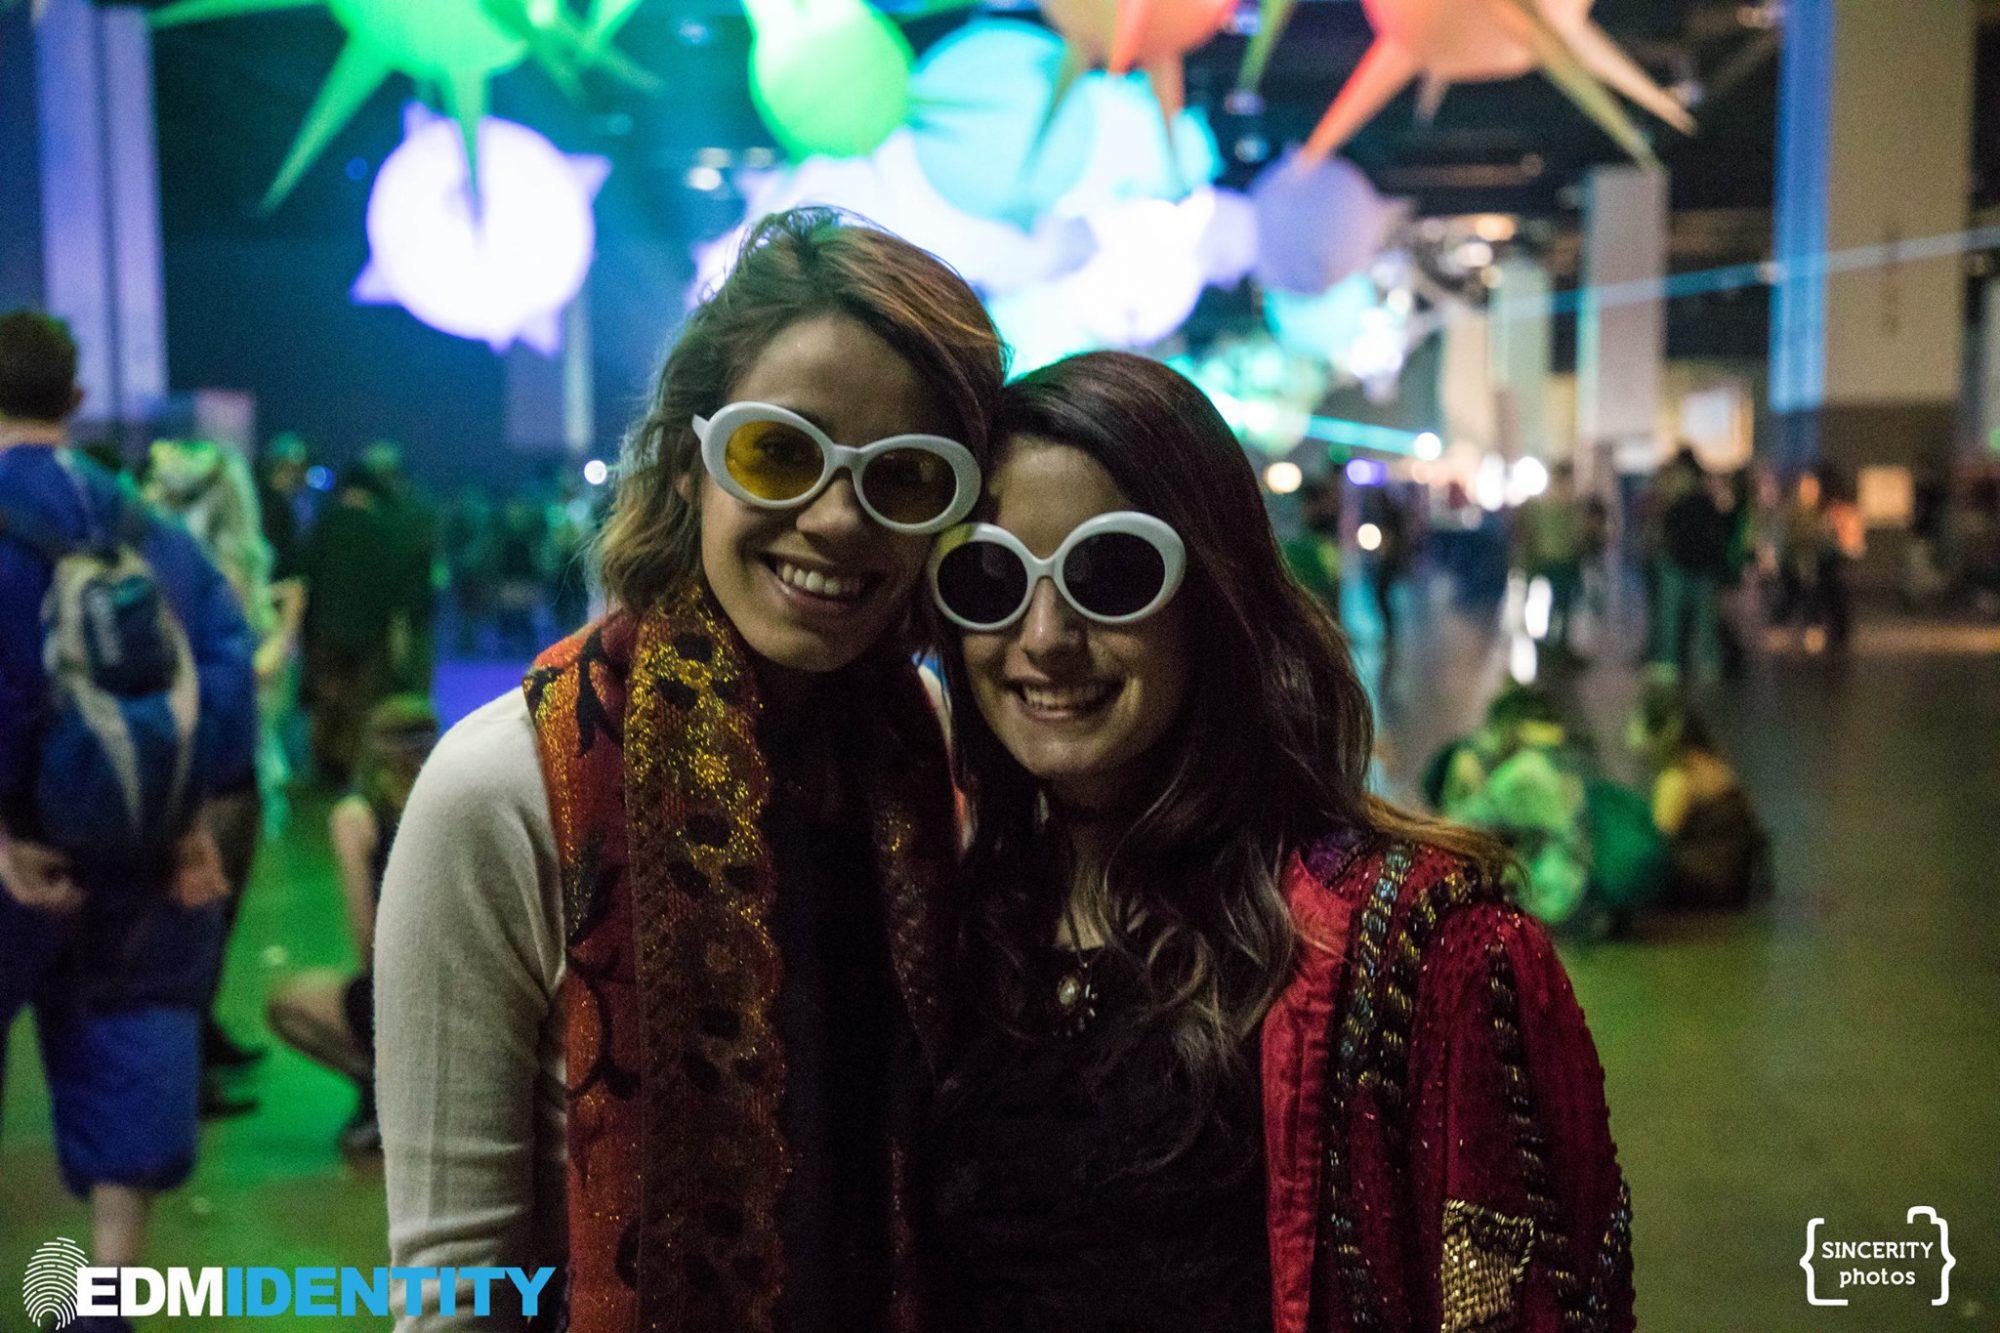 Decadence Colorado Girls with Sunglasses